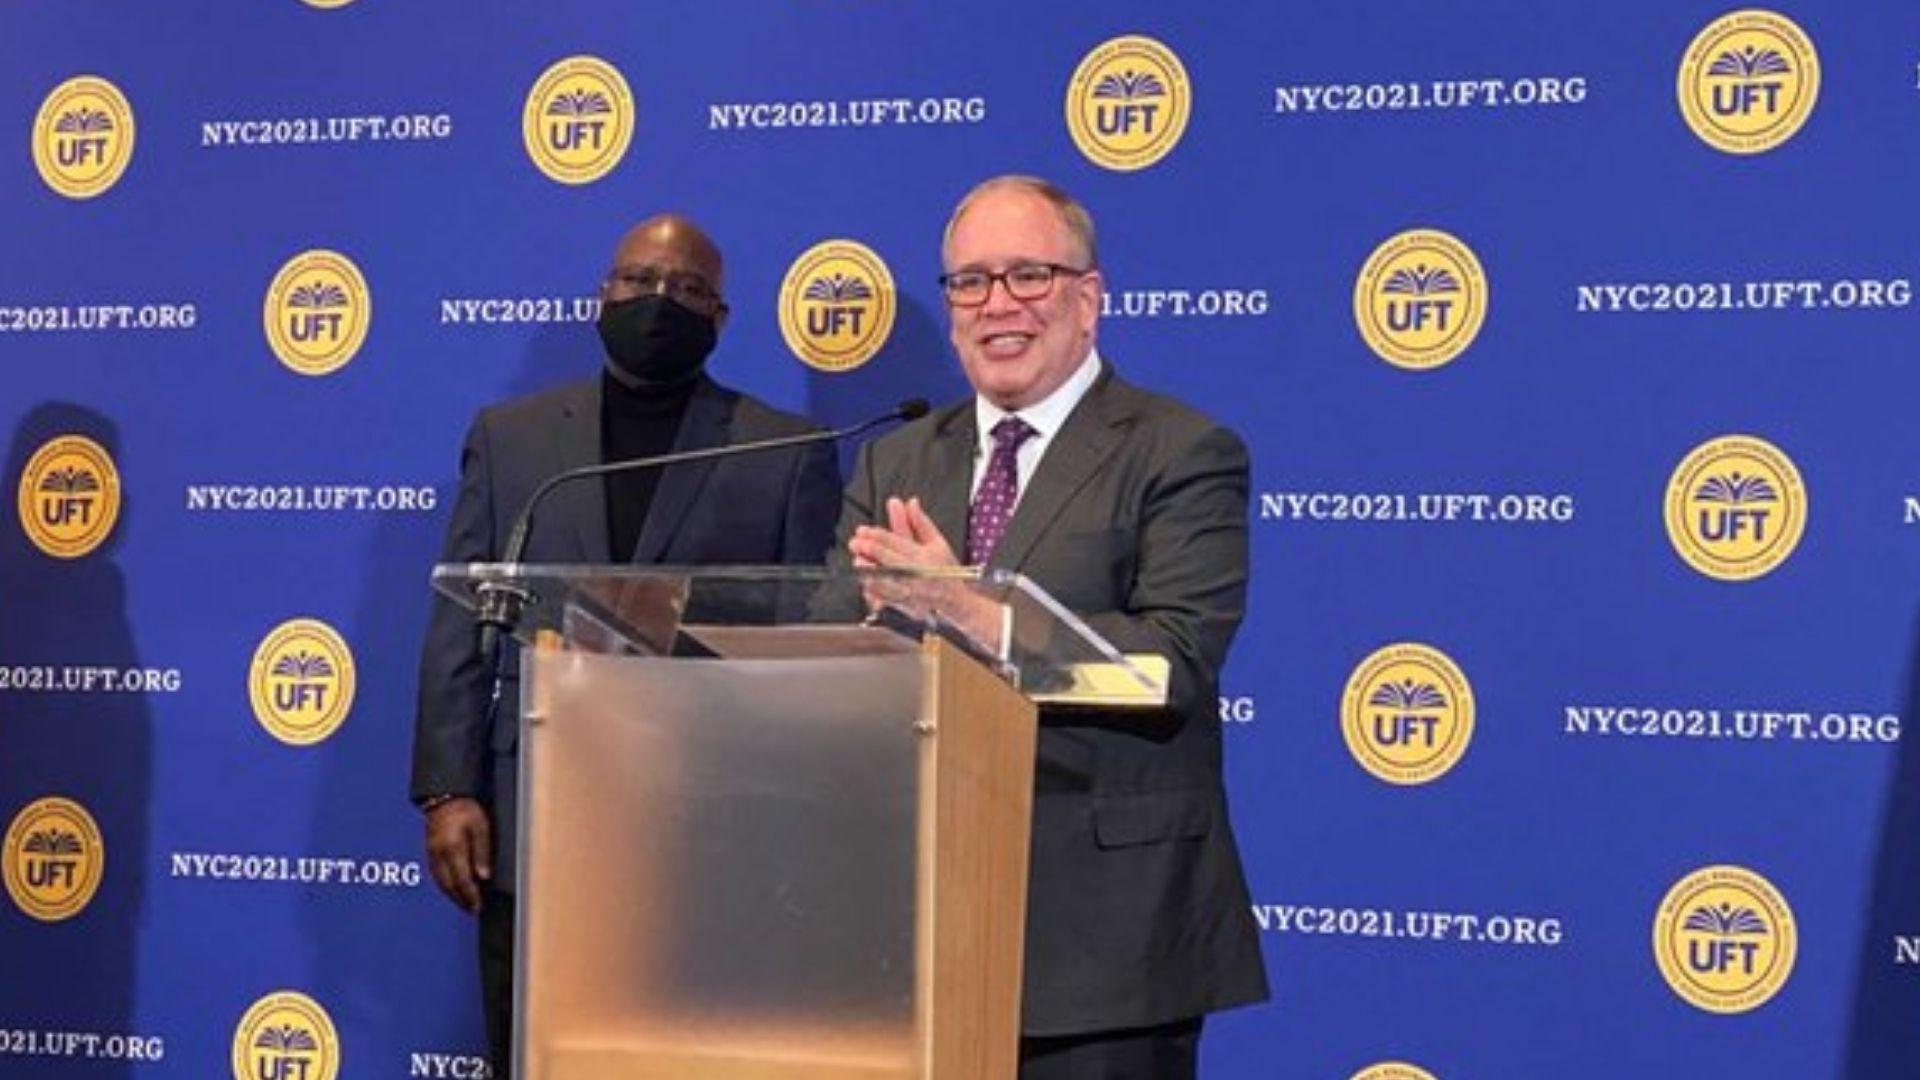 New York's United Federation of Teachers, the nation's largest teachers union, has endorsed Scott Stringer for the mayor of New York City.